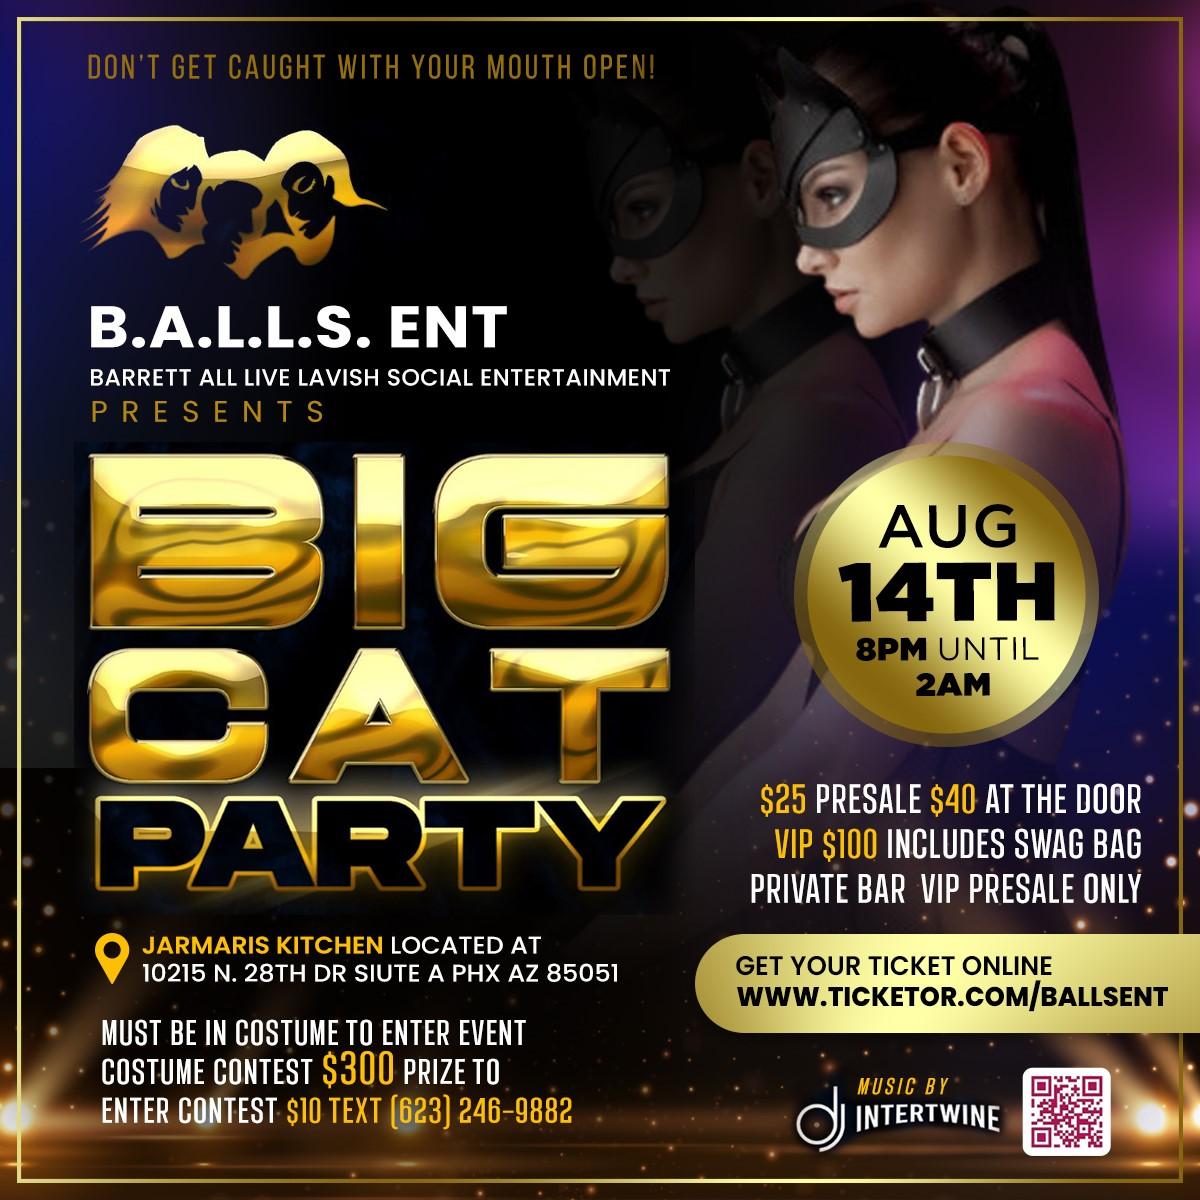 Big Cat Party  on Aug 14, 20:00@Jamaris' Kithen - Buy tickets and Get information on www.ballsent.com ballsent